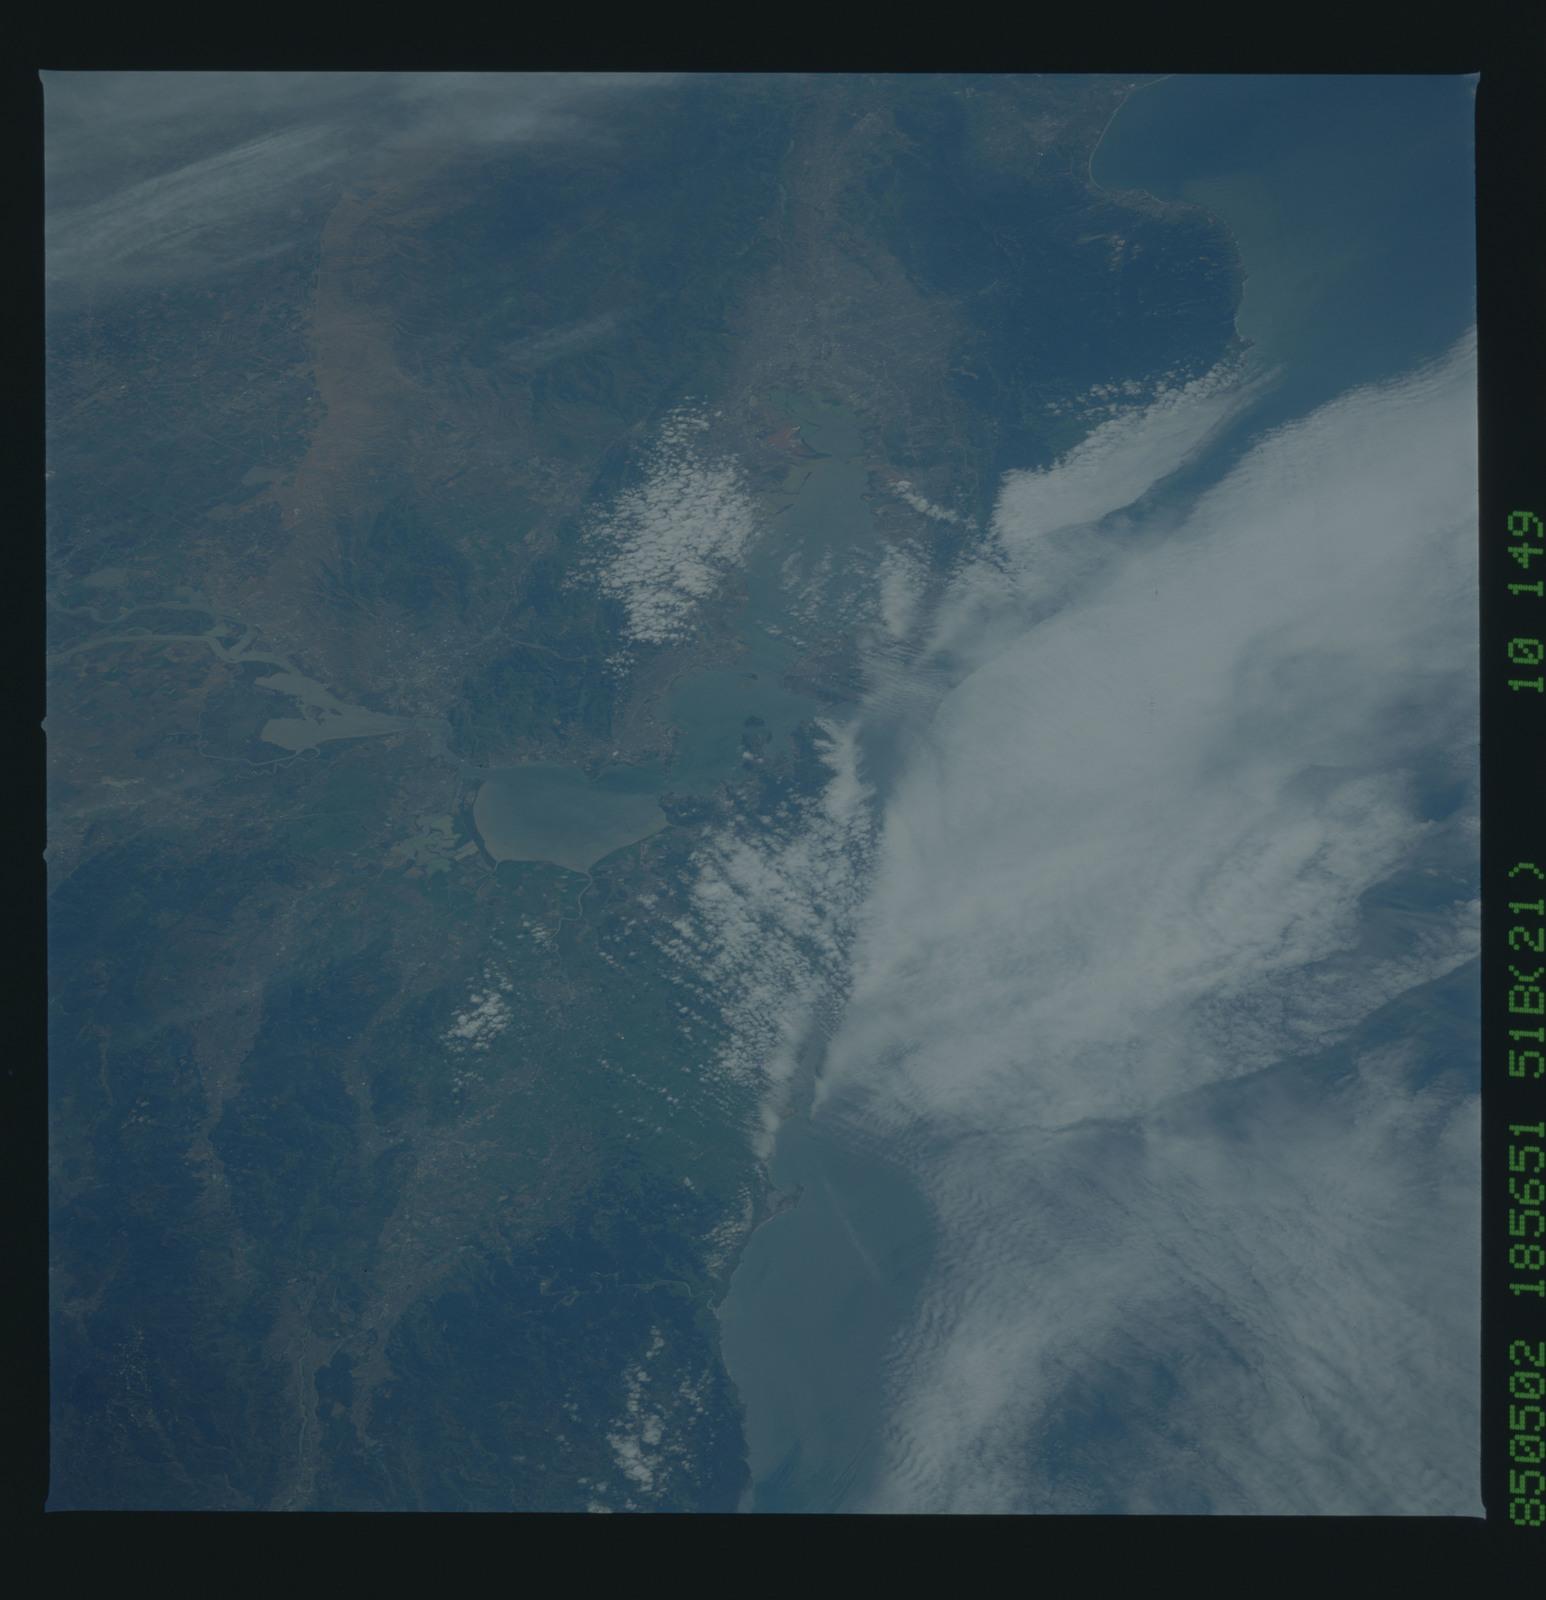 51B-52-047 - STS-51B - STS-51B earth observation